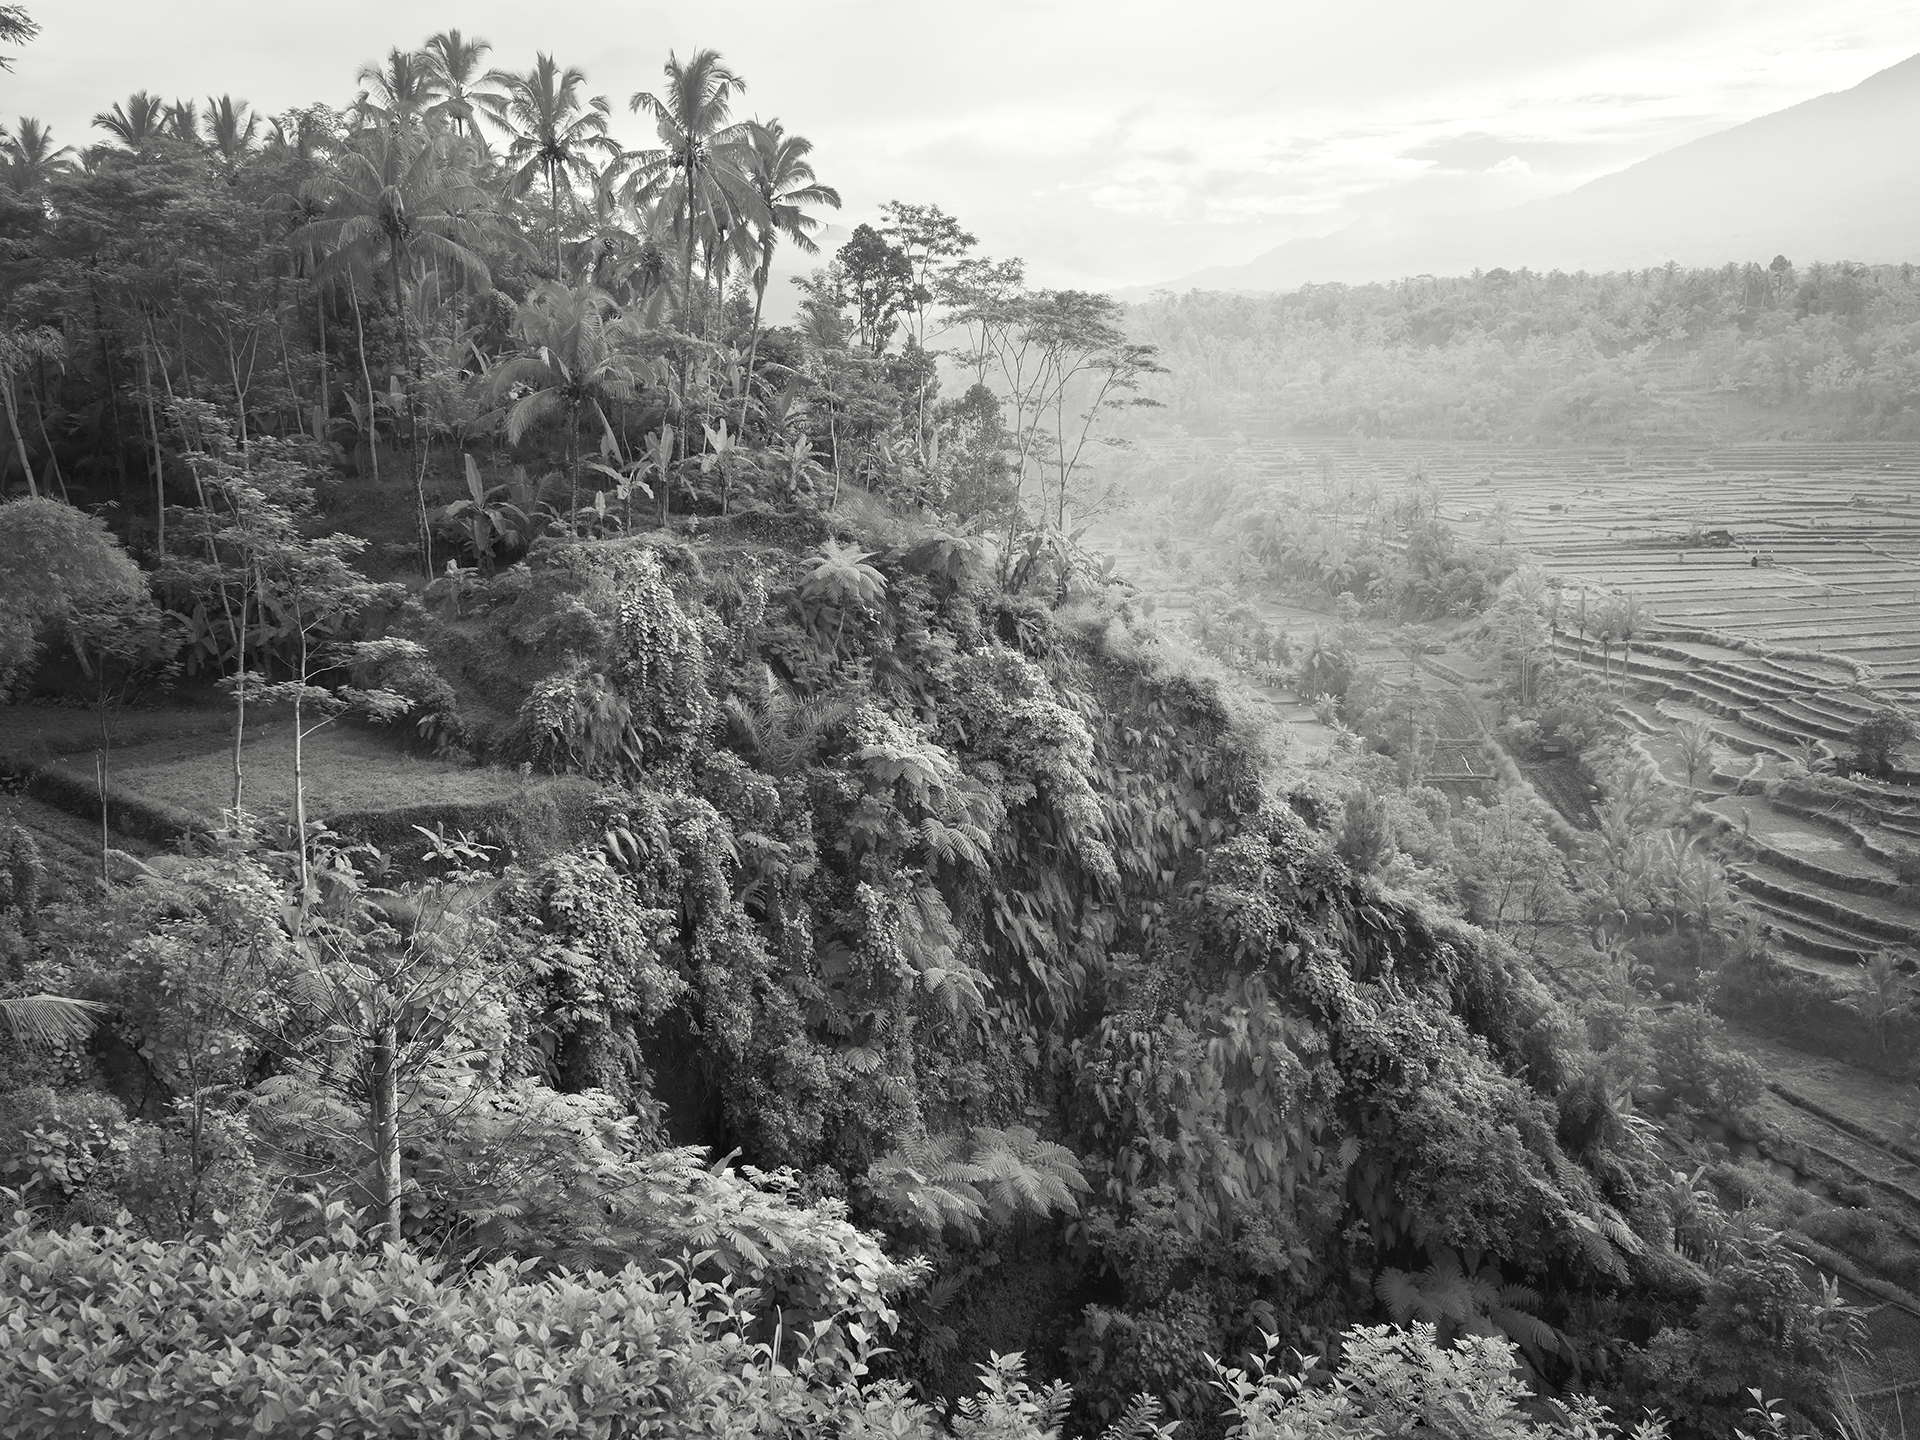 Ferns and fields, Bali, - 2010 copy.jpg